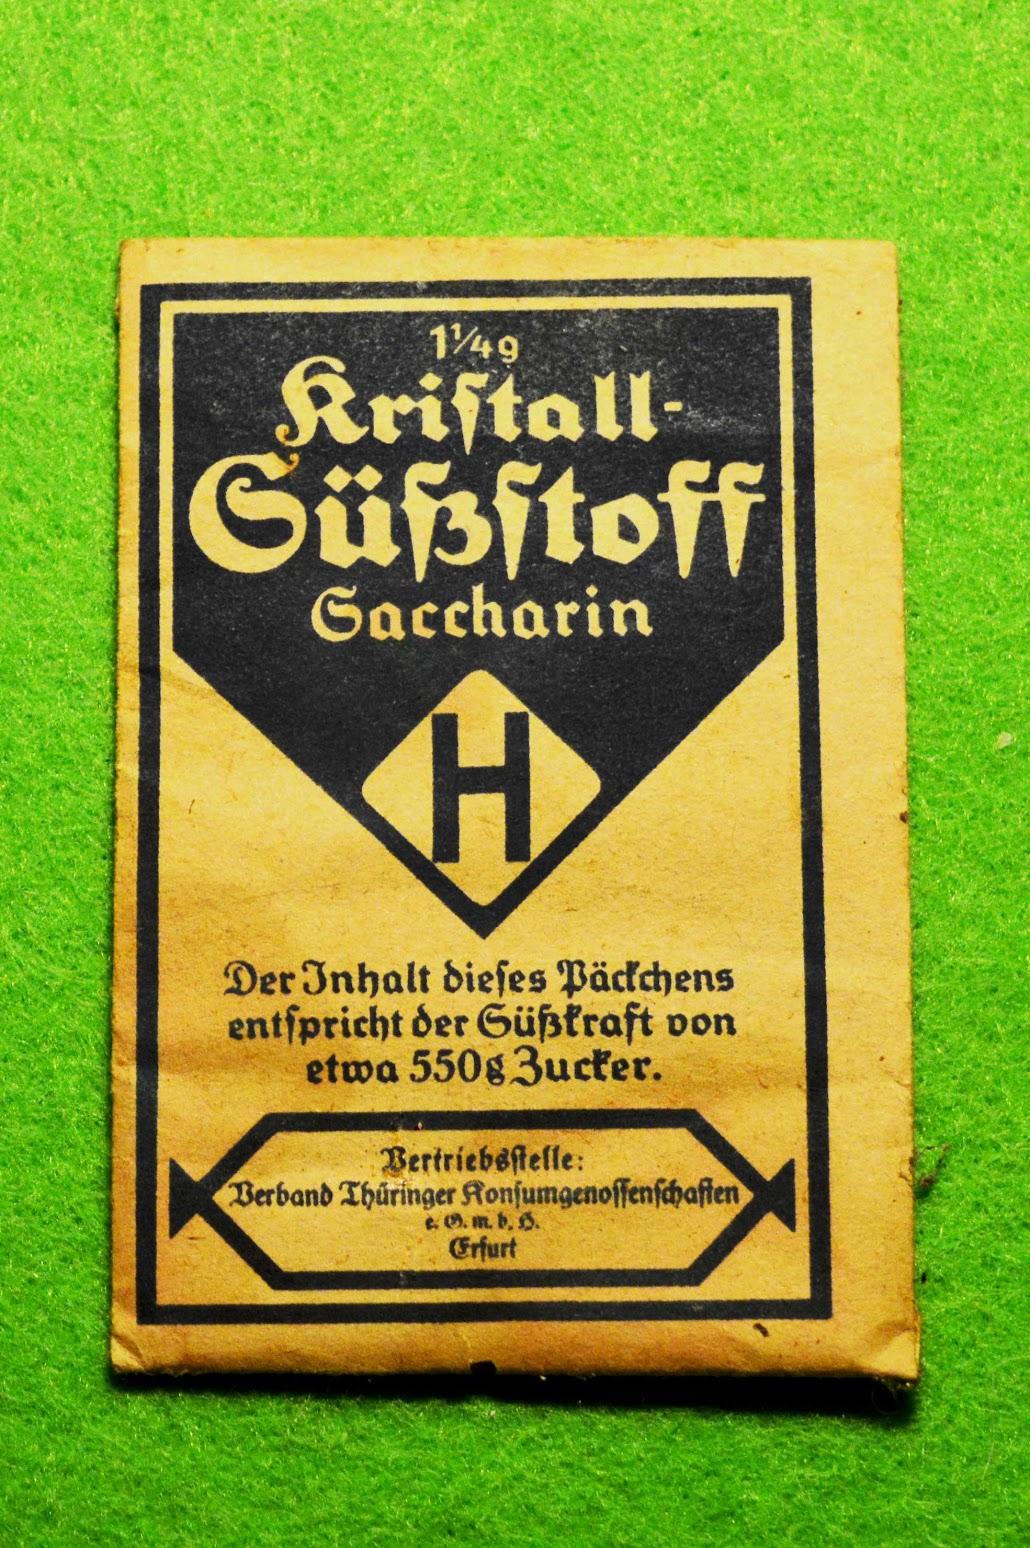 Kristall-Süßstoff Saccharin H-Packung - 1930